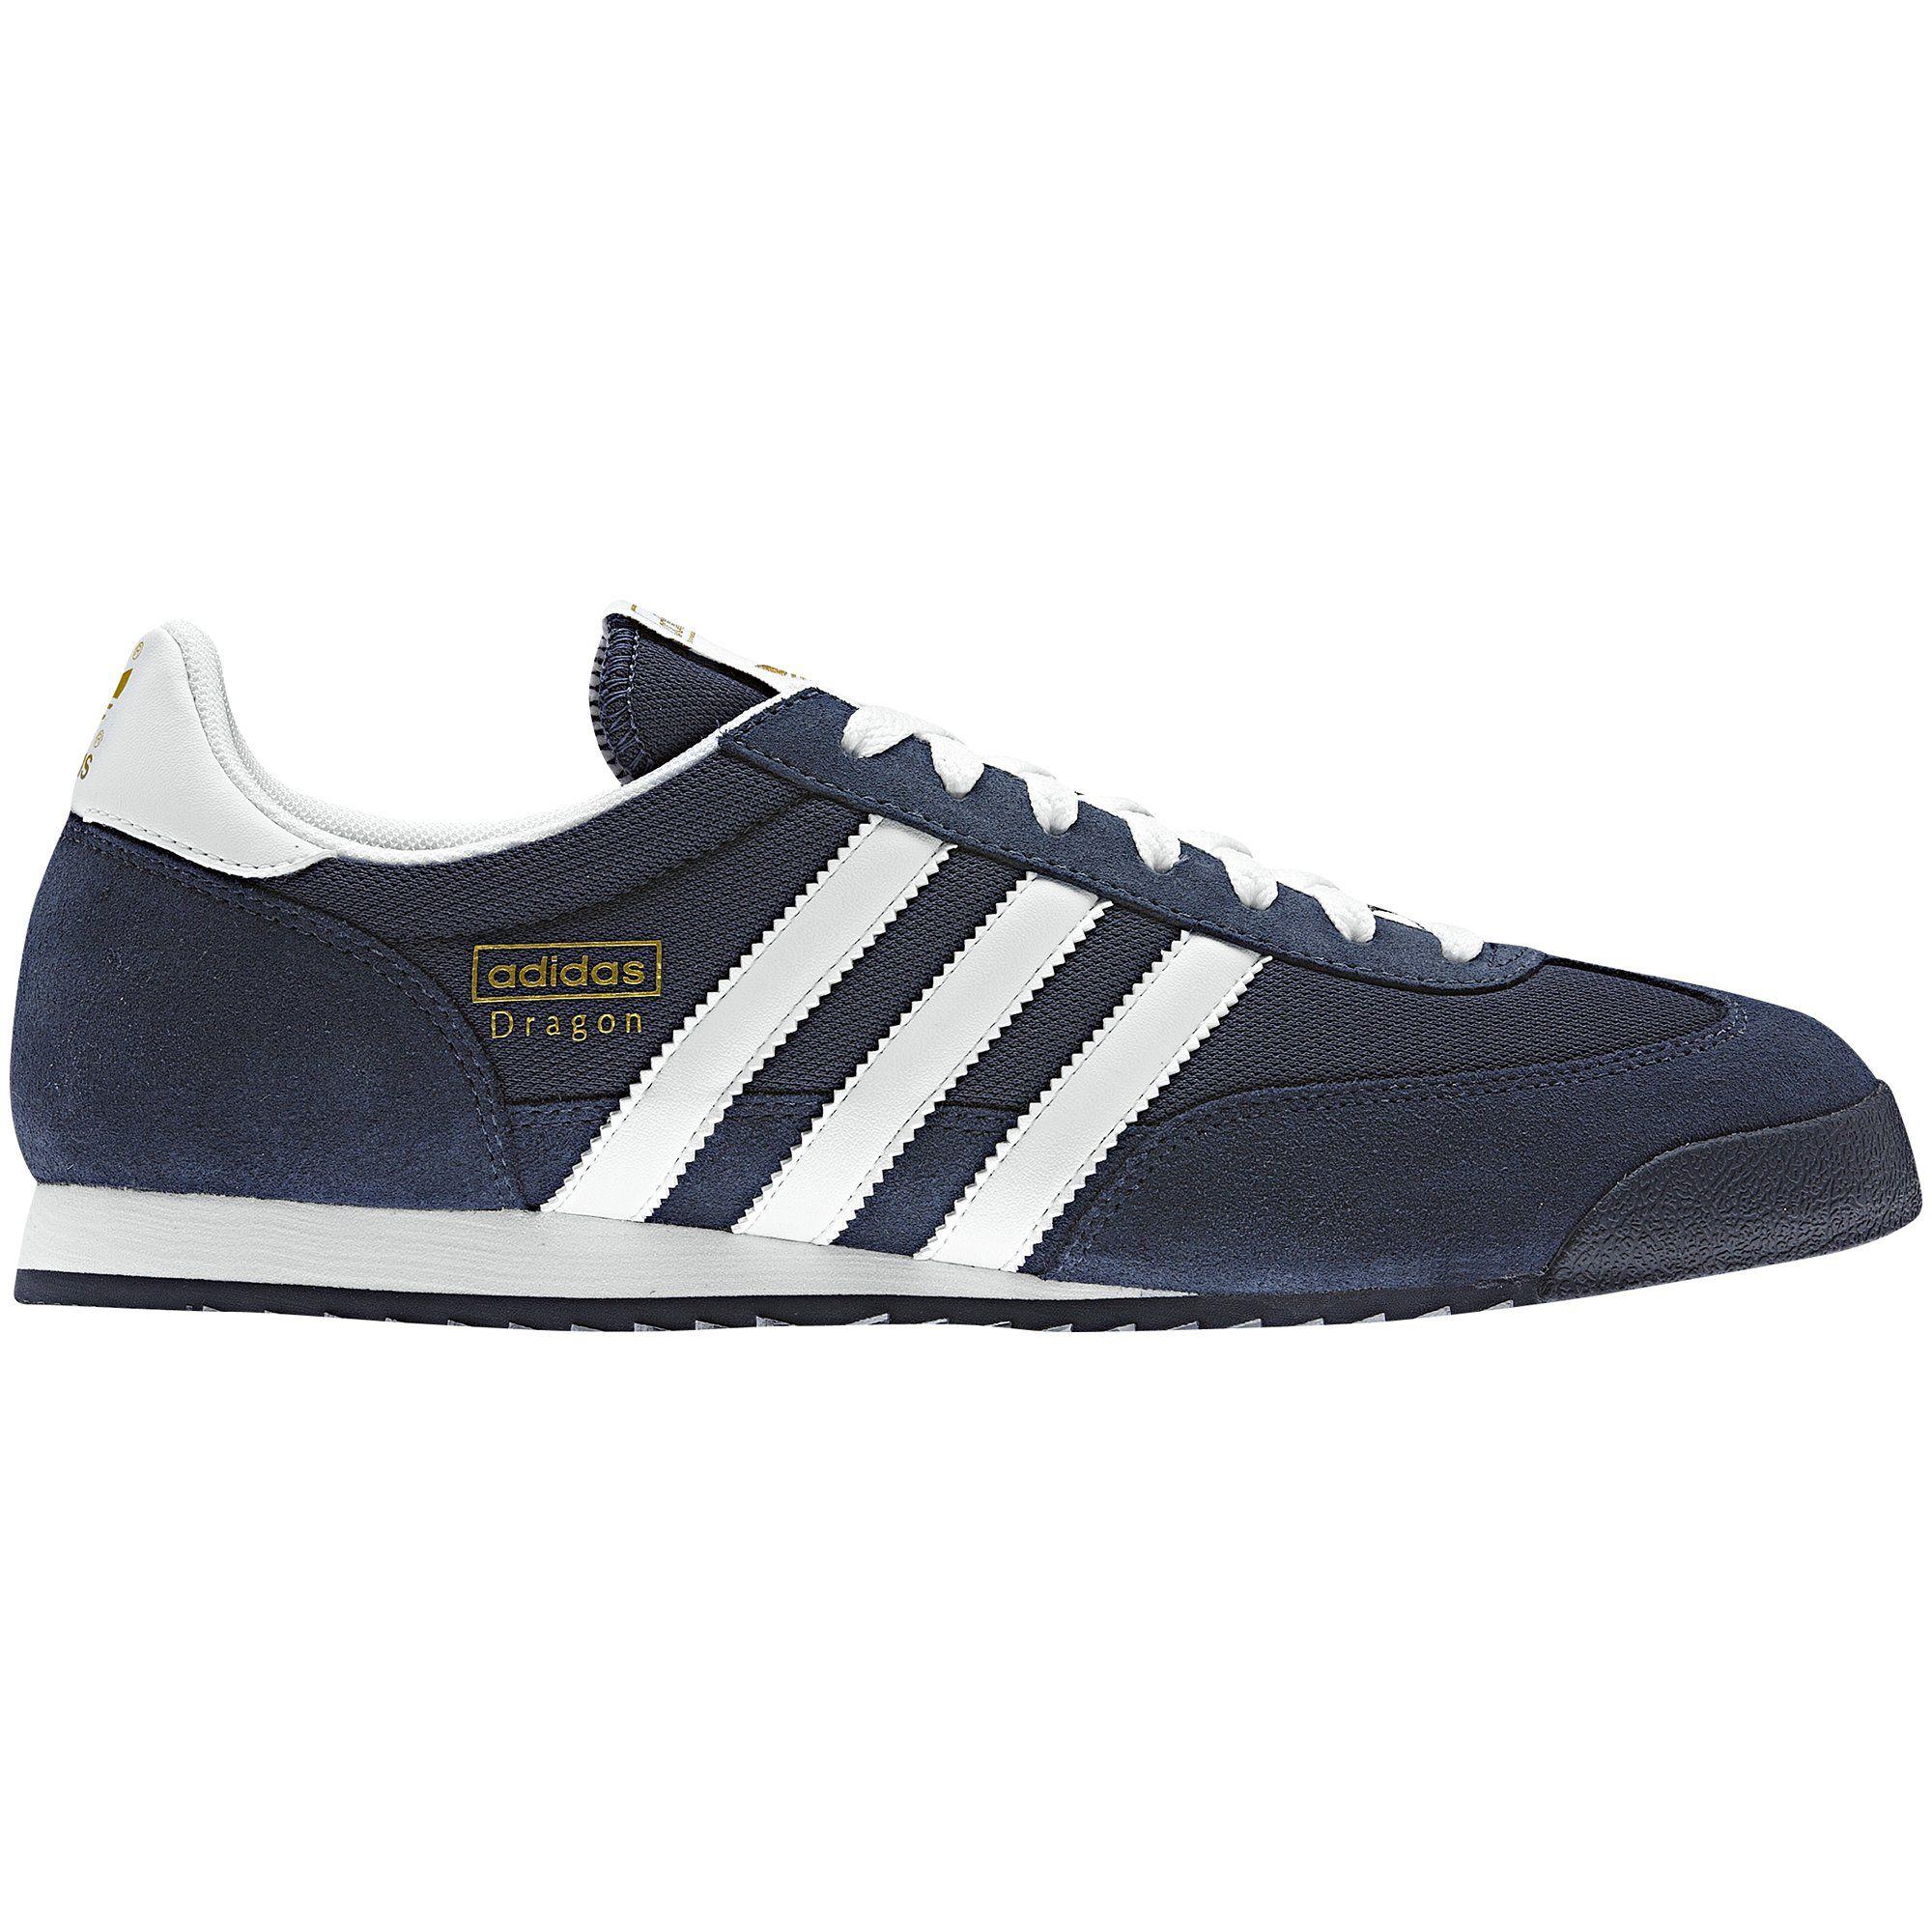 best authentic d2373 687a4 Men s Dragon, New Navy   Metallic Gold   White Blue Adidas, Adidas Neo,